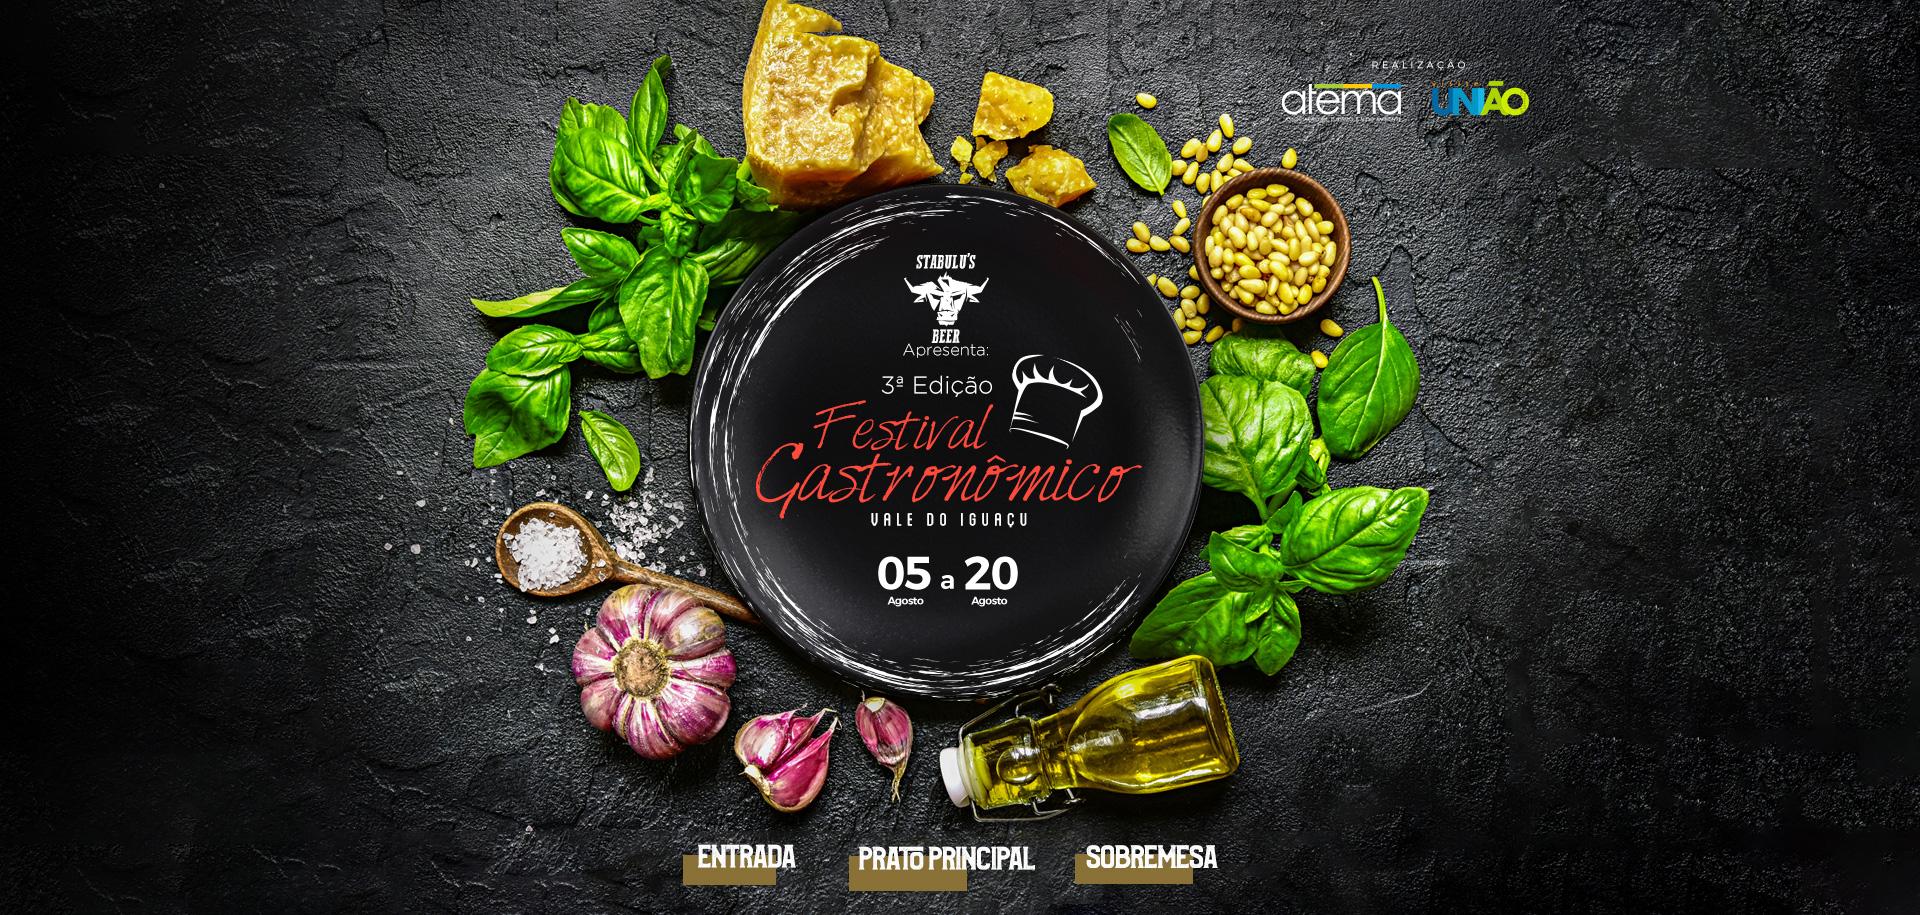 3ª Edição Festival Gastronômico